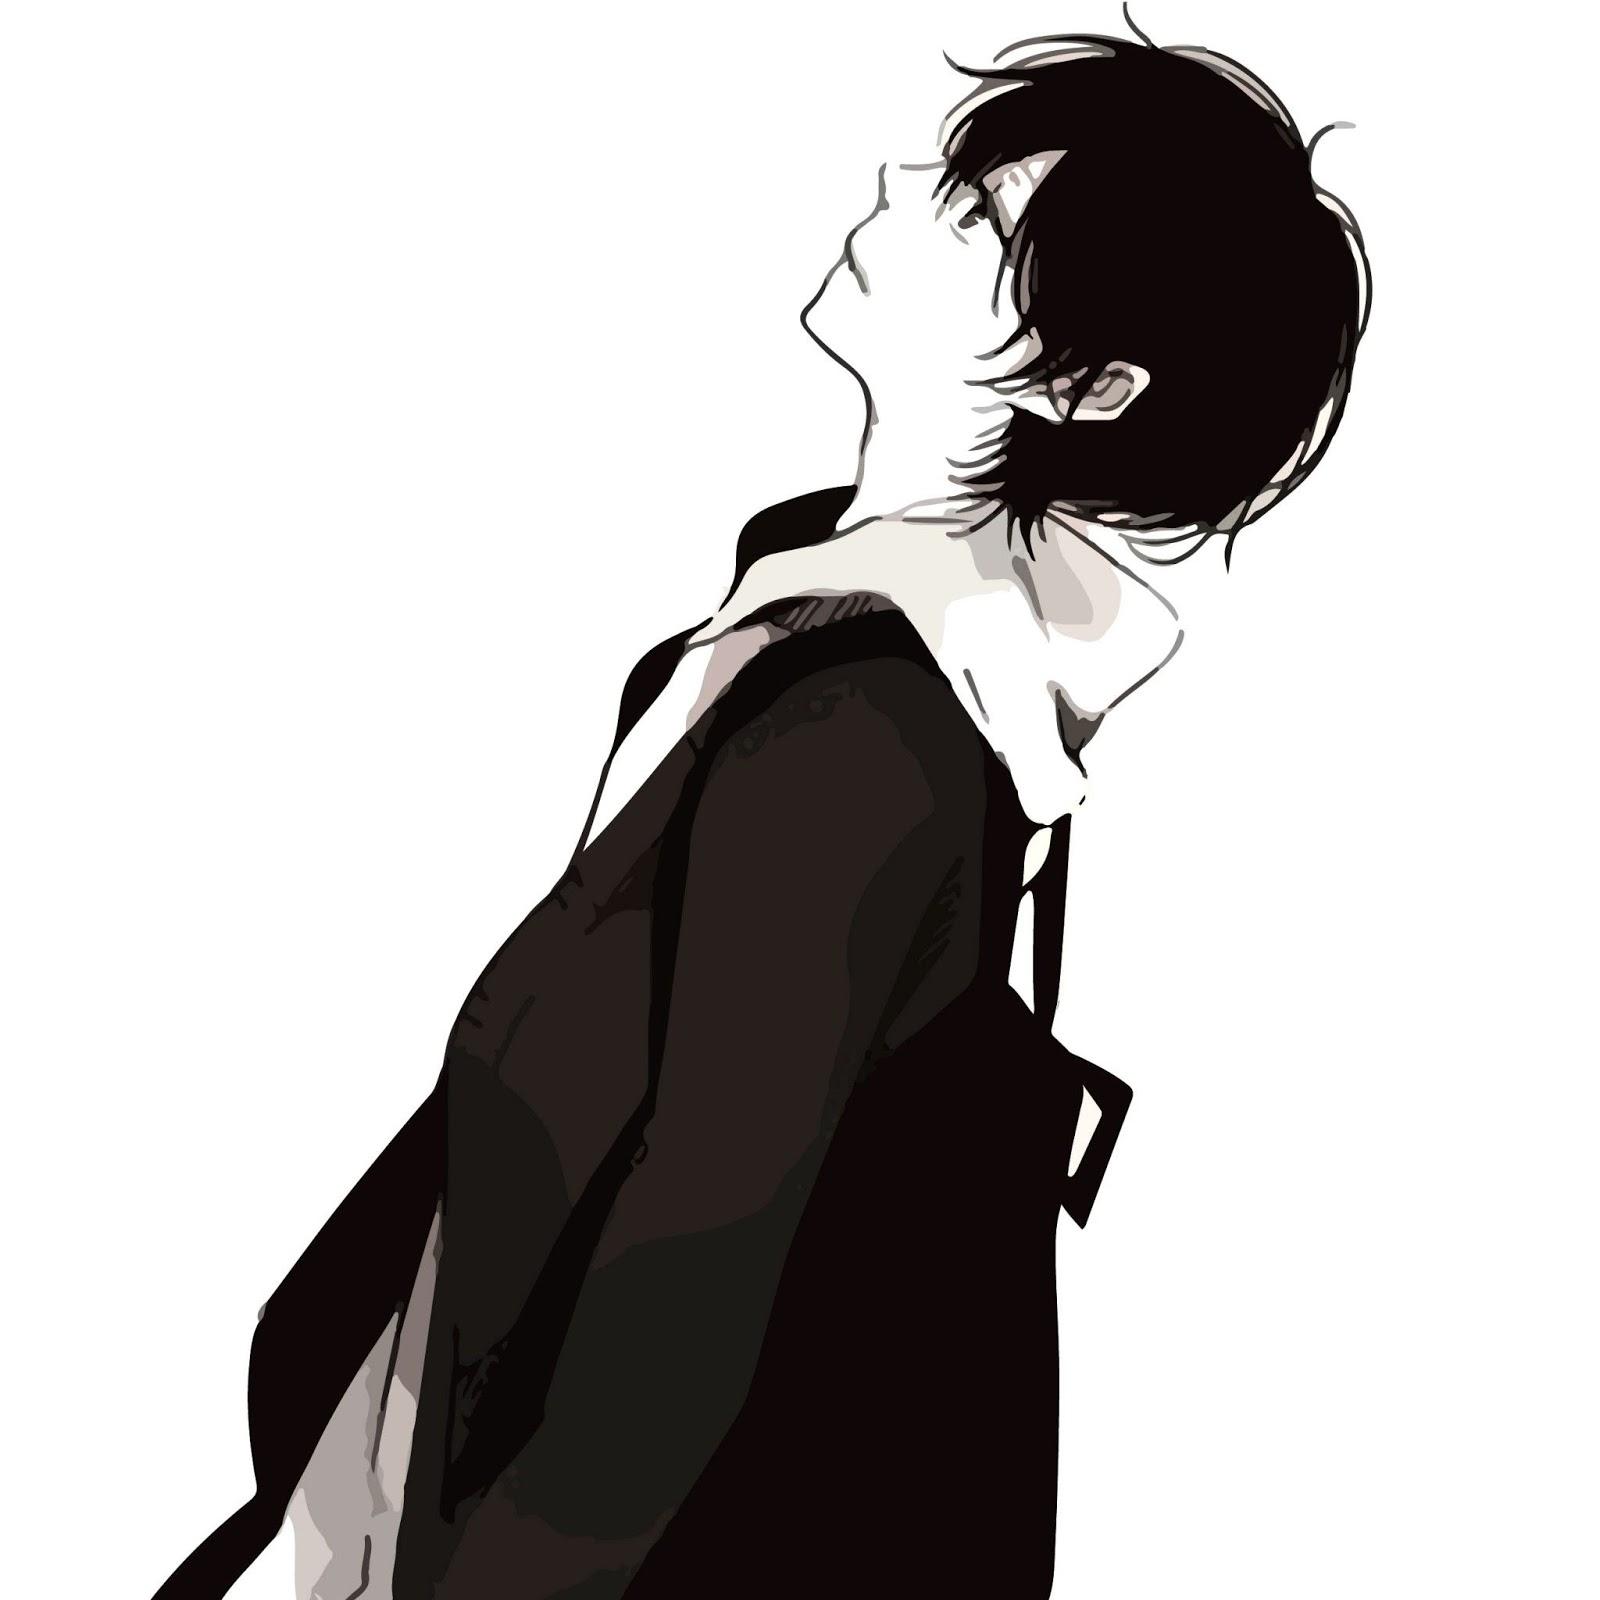 Unduh 61 Koleksi Wallpaper Hd Anime Sad Boy HD Terbaru